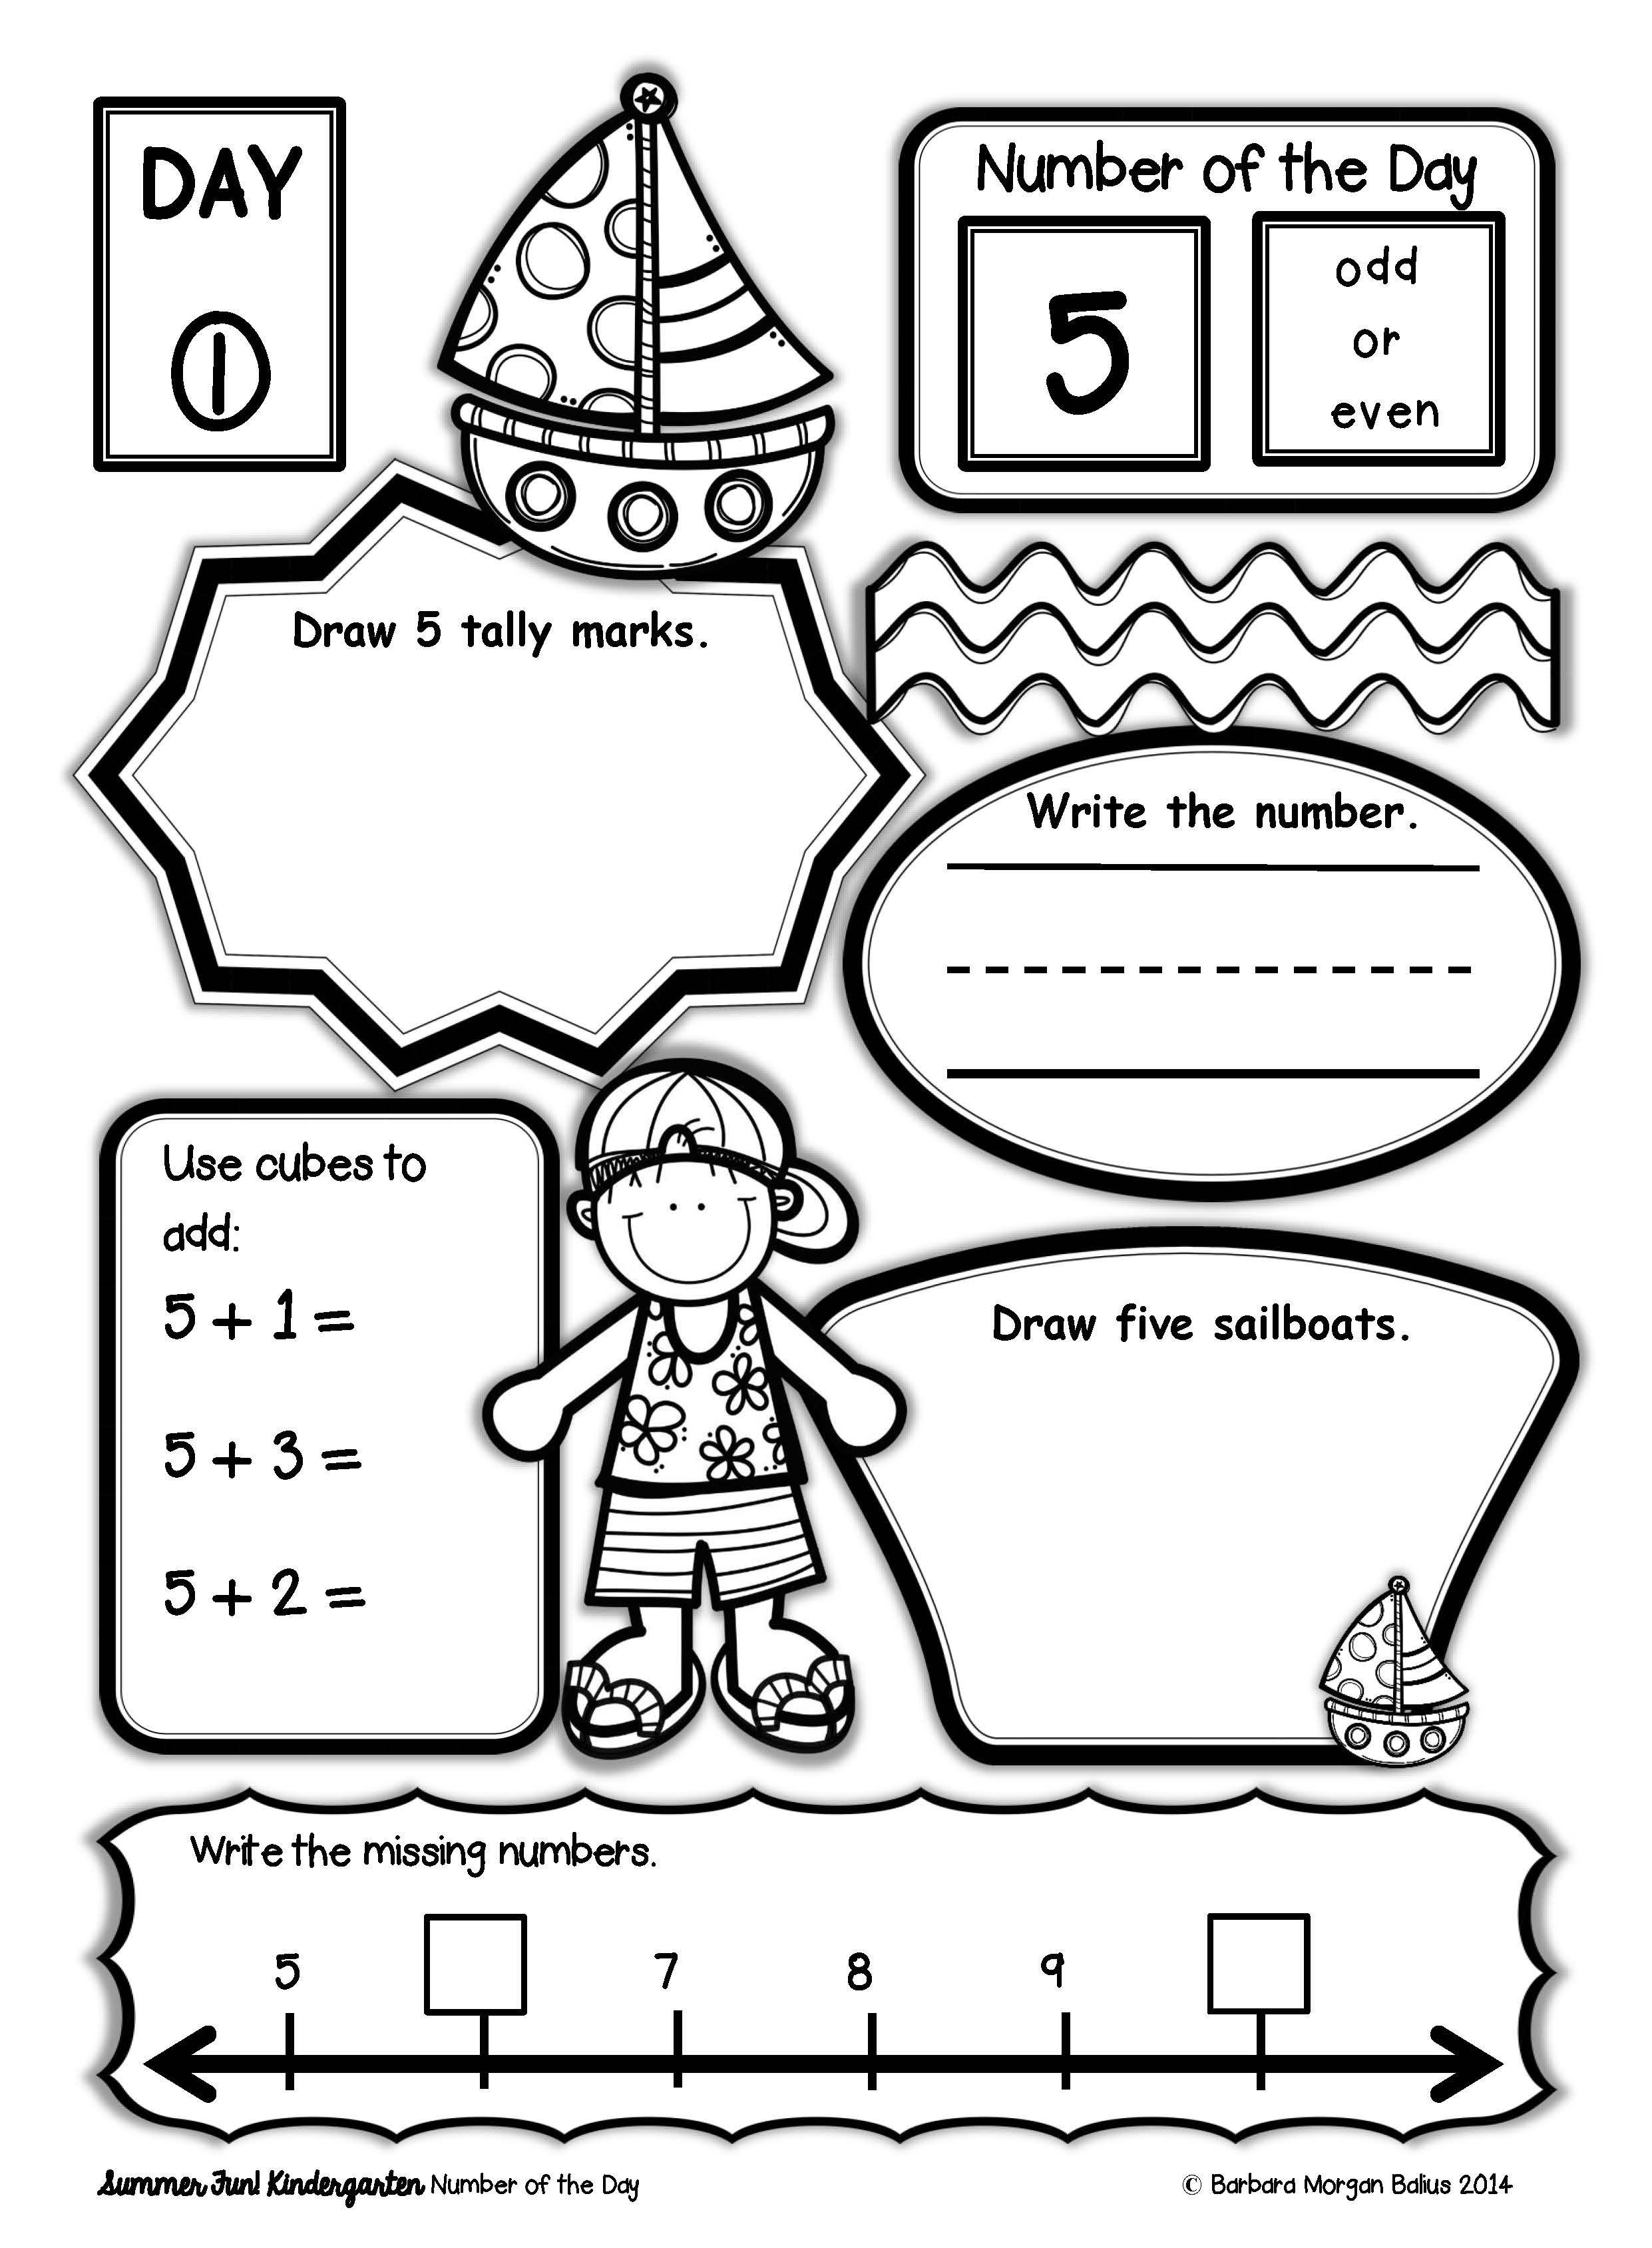 Summer Math Kindergarten Number of the Day